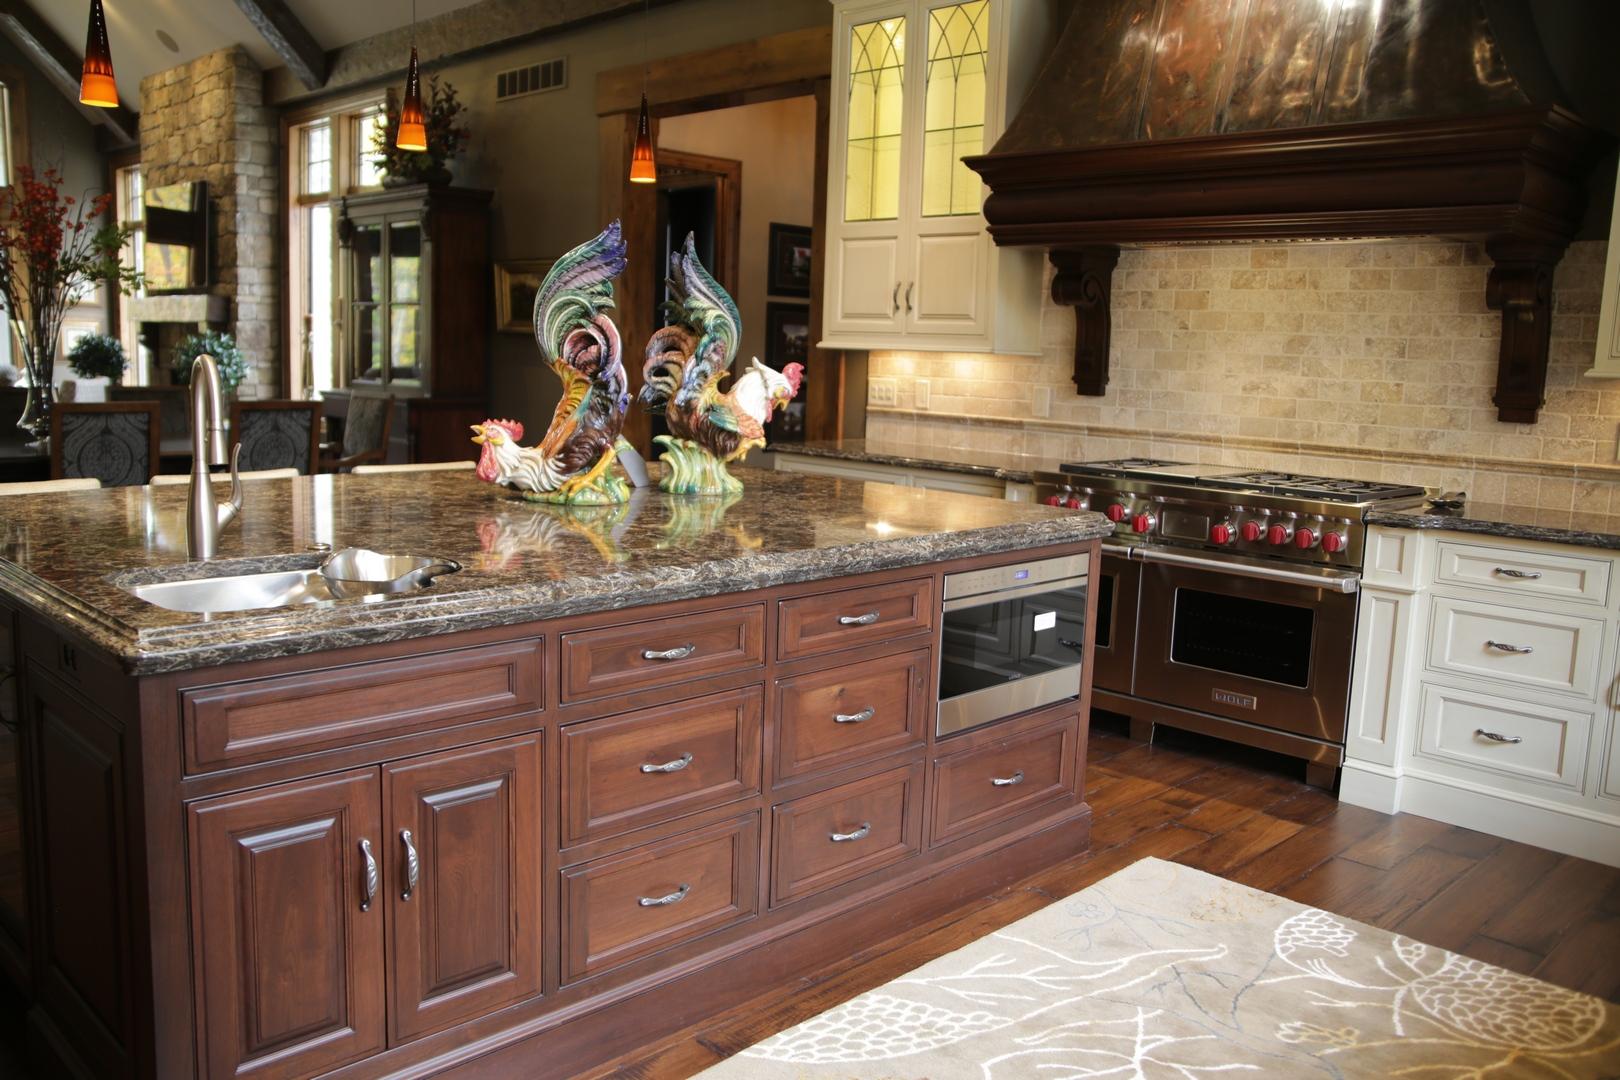 kc02 kitchen island prestige homes luxury home builders. Black Bedroom Furniture Sets. Home Design Ideas